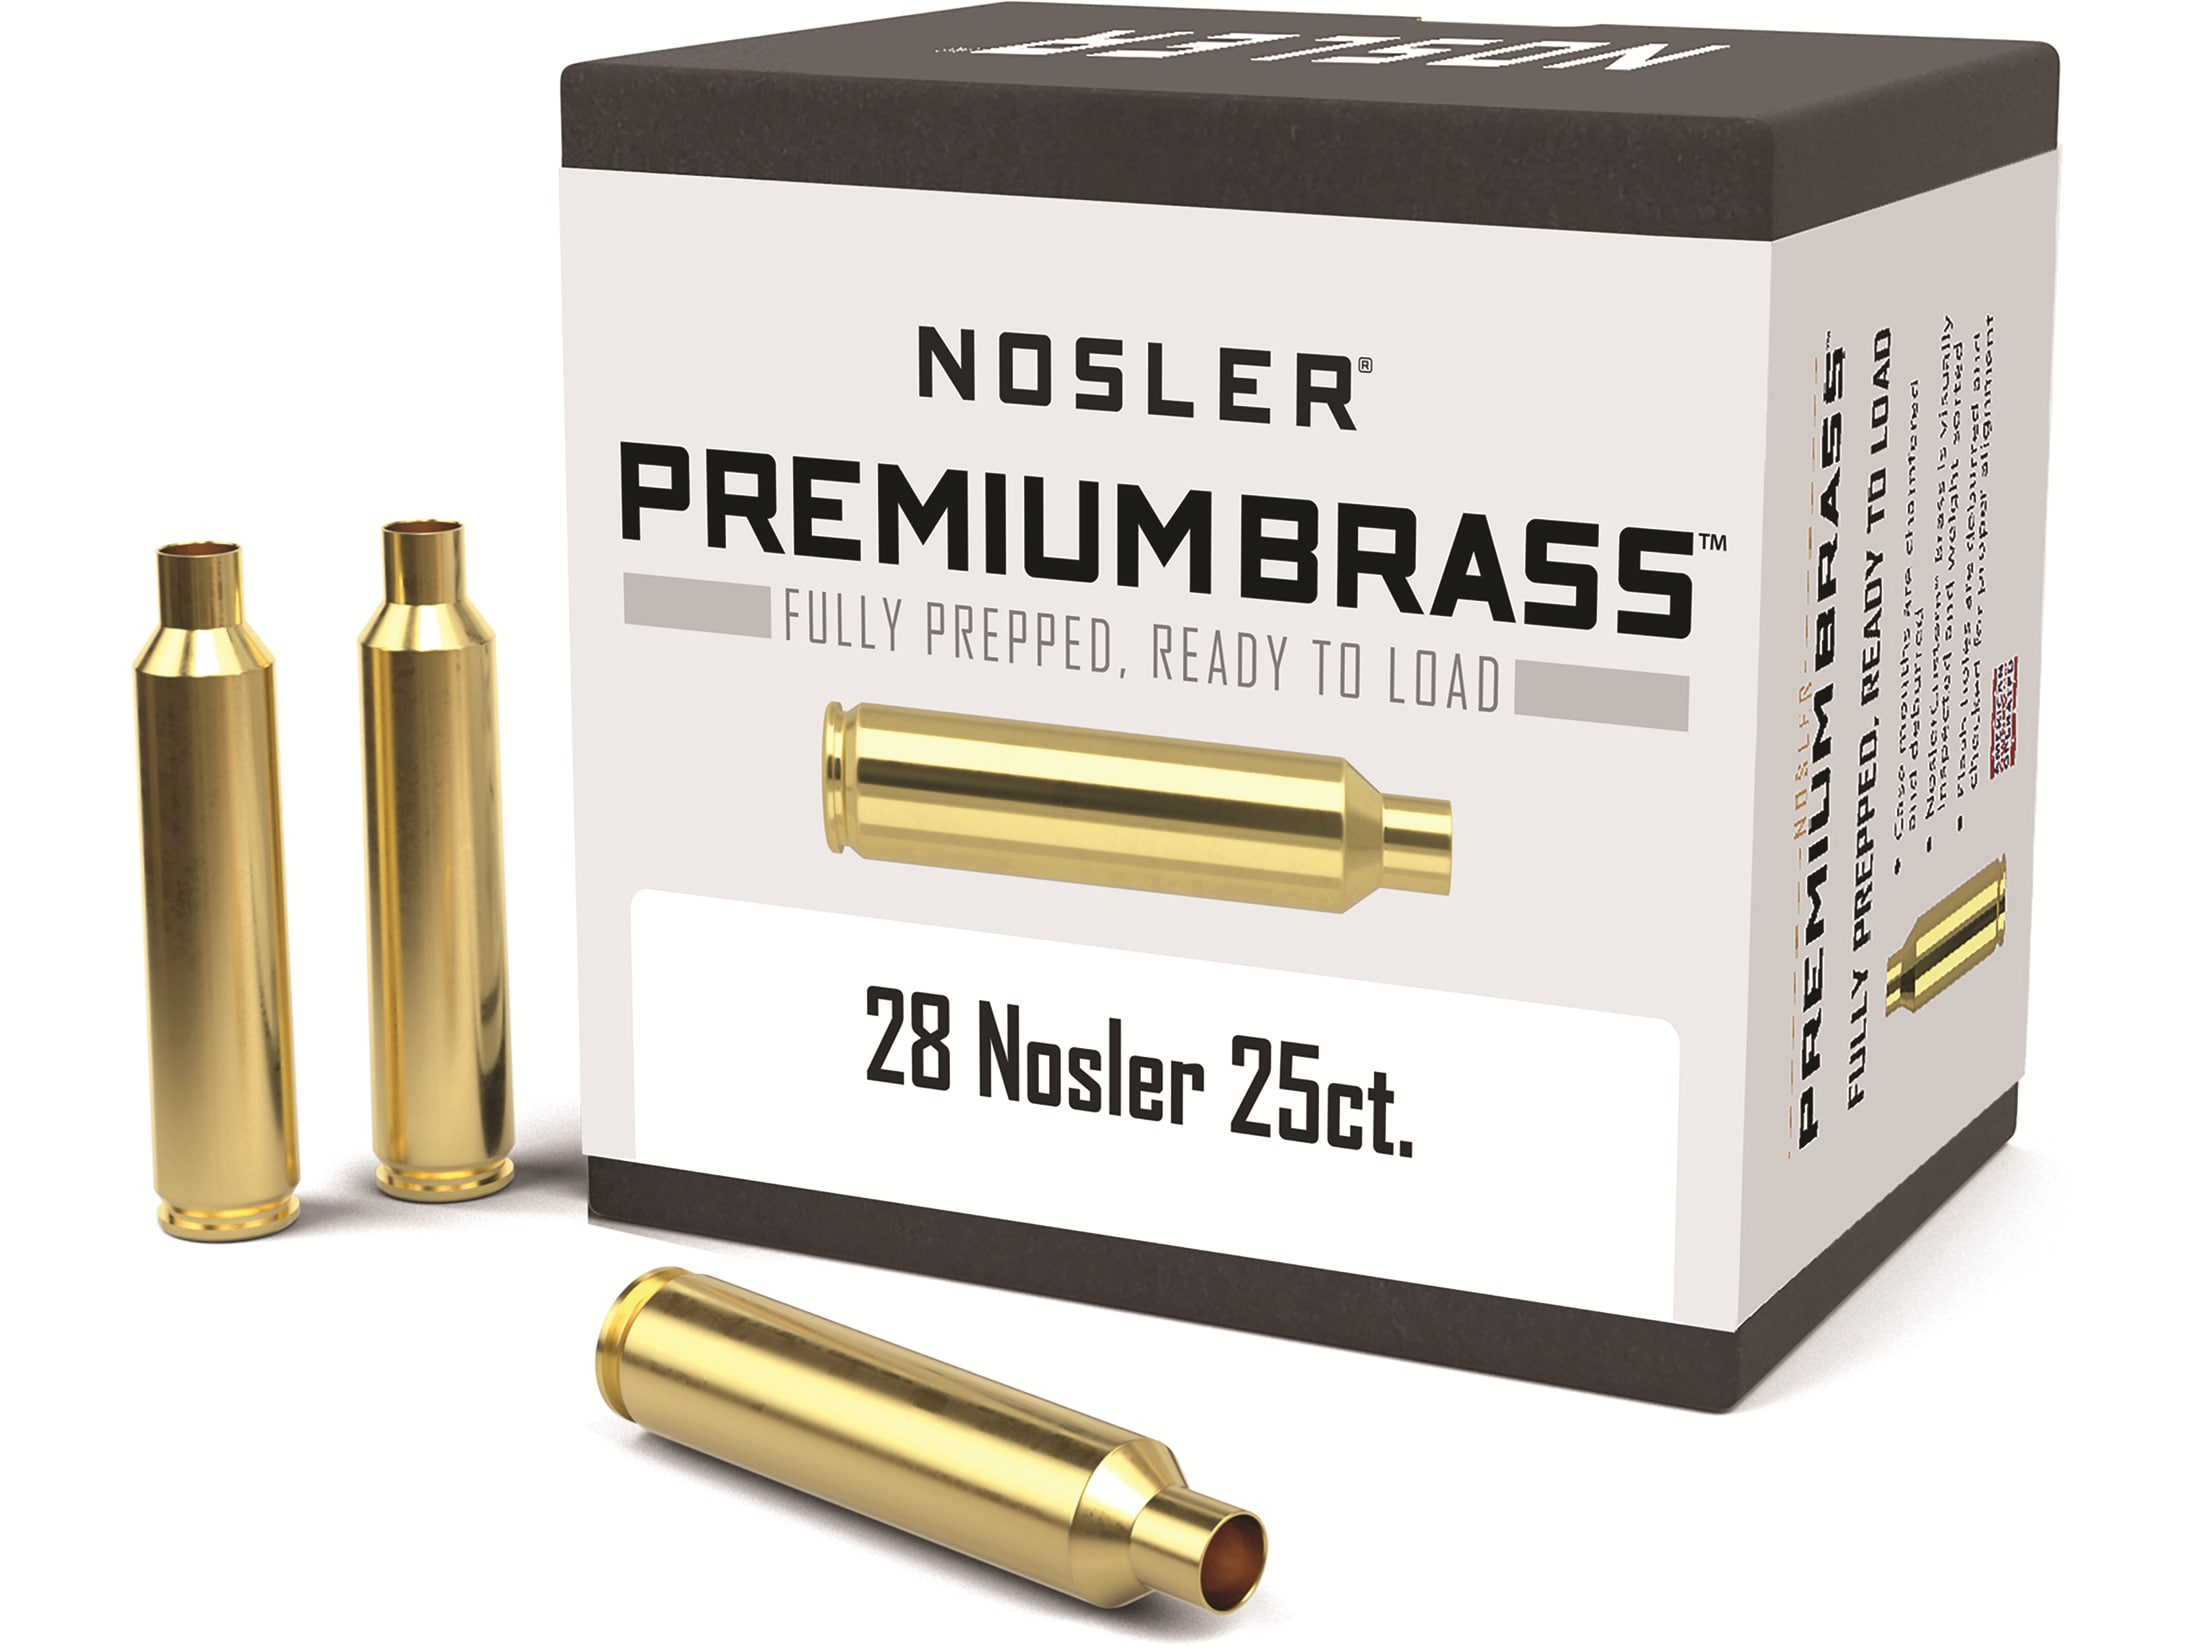 Nosler | Reloading Brass | Rifle Ammo | Bullets -MidwayUSA